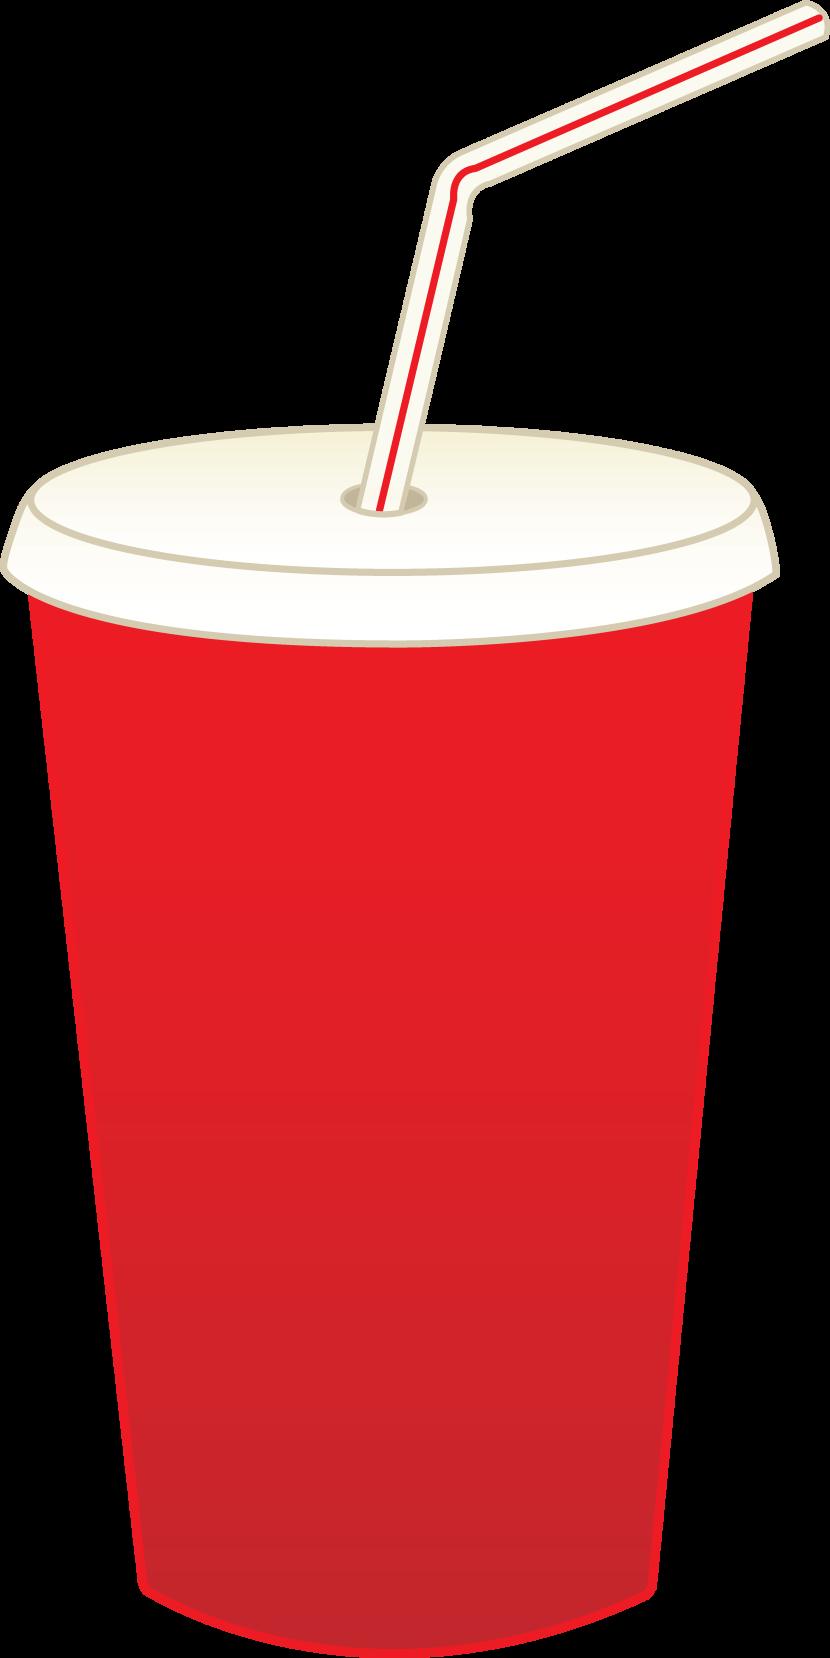 Soda clipart 2.